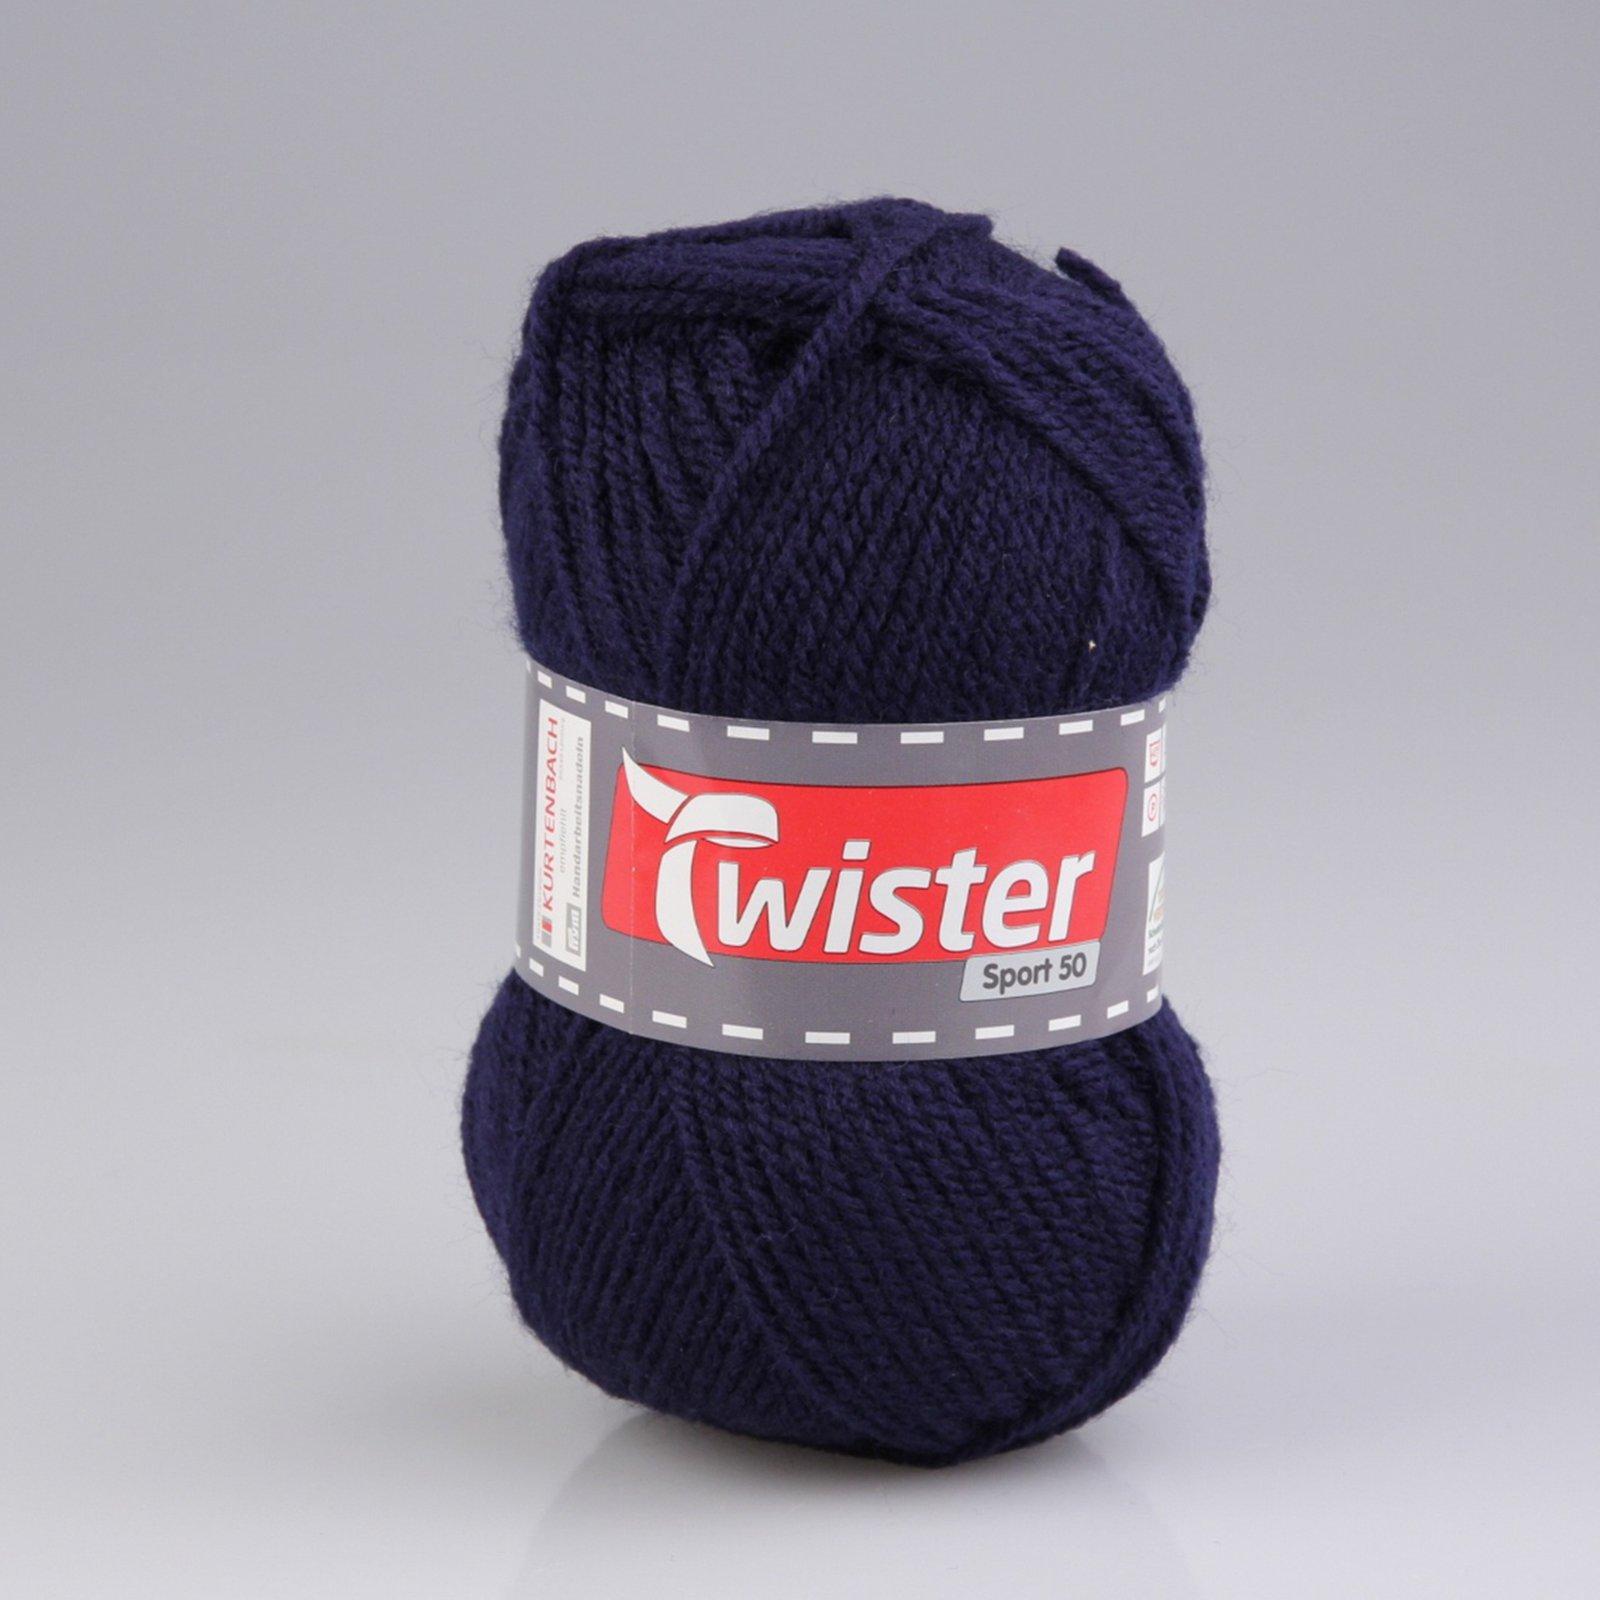 Wolle TWISTER SPORT UNI - marine - 50g